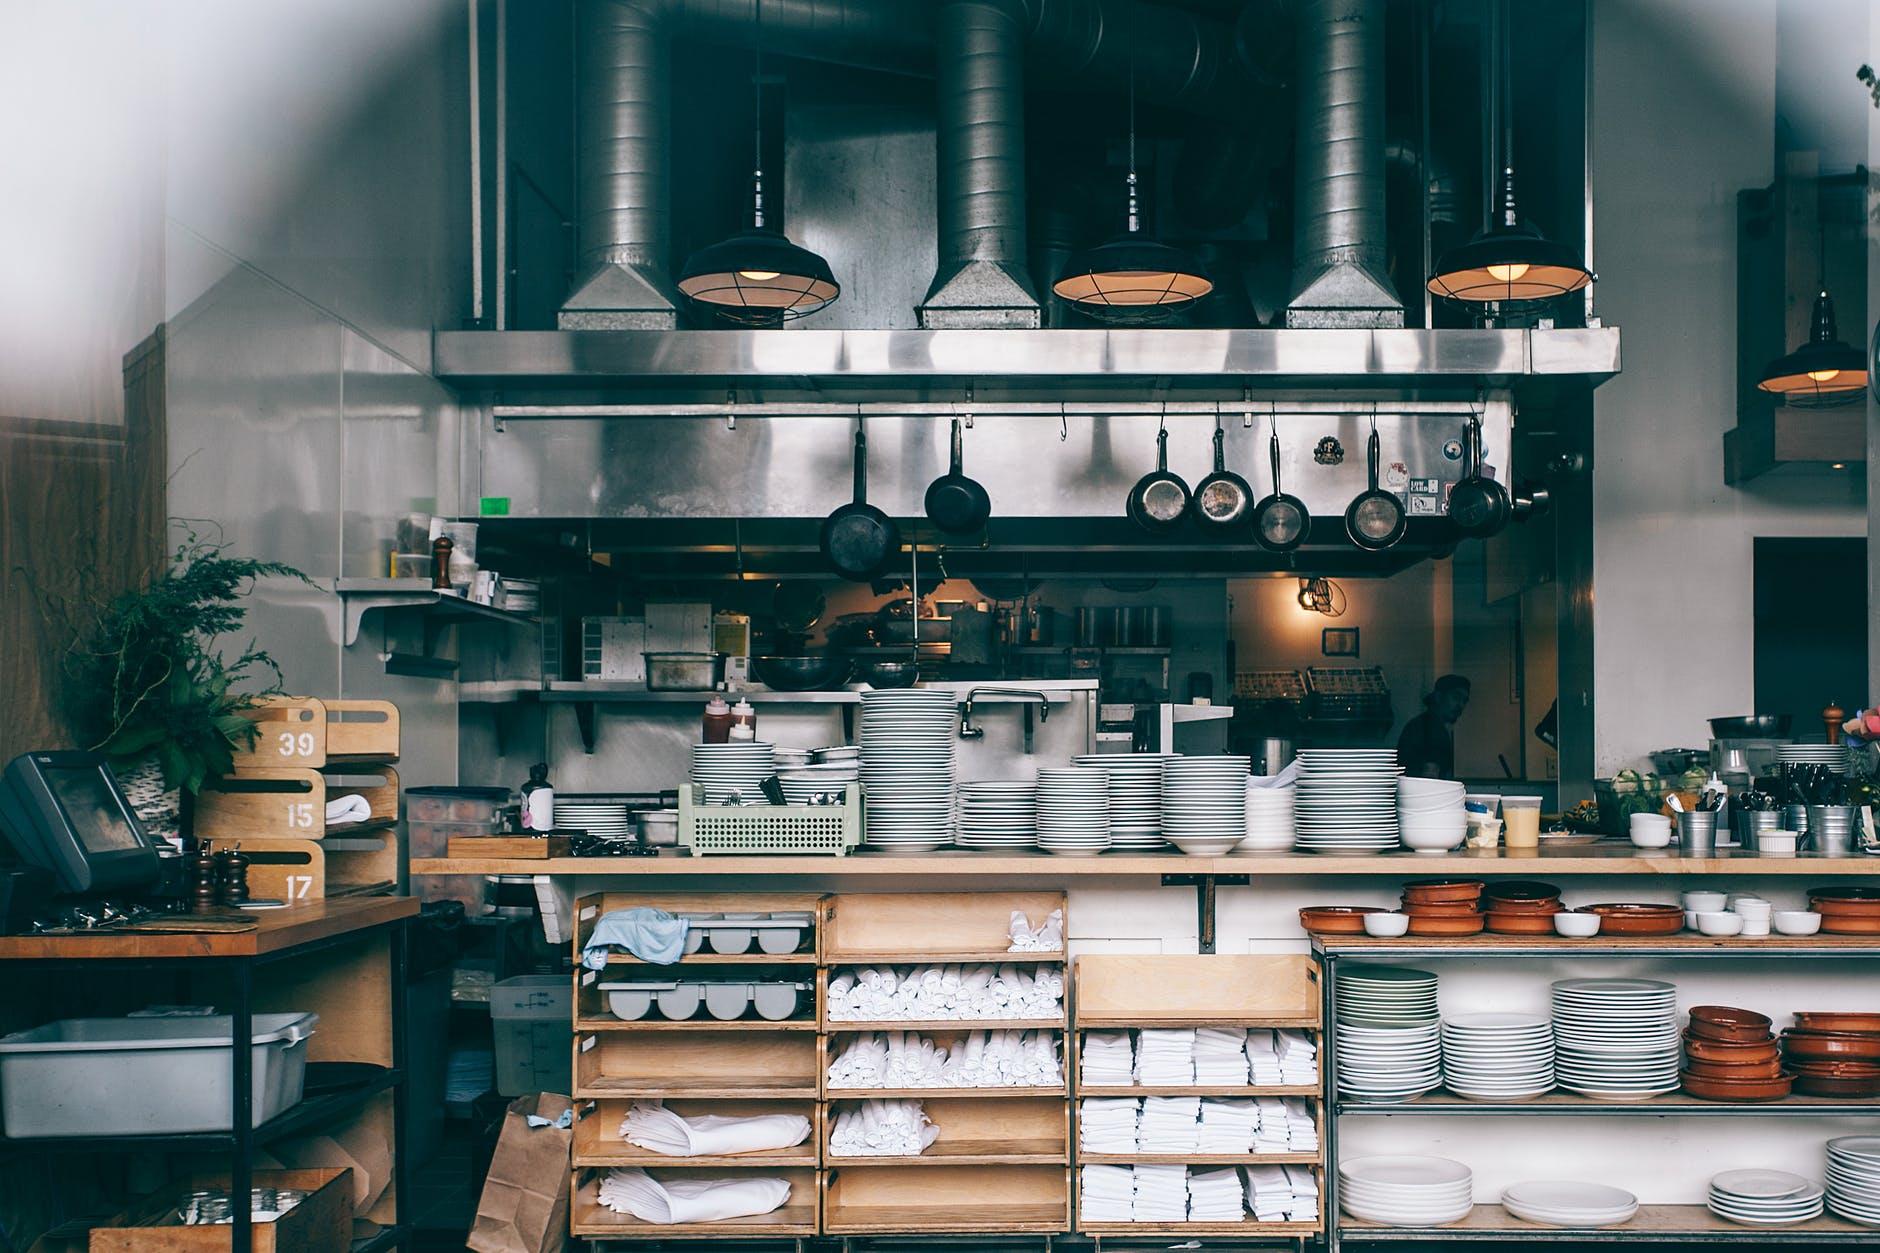 Folha De Pagamento De Restaurante - Auster Inteligência Contábil